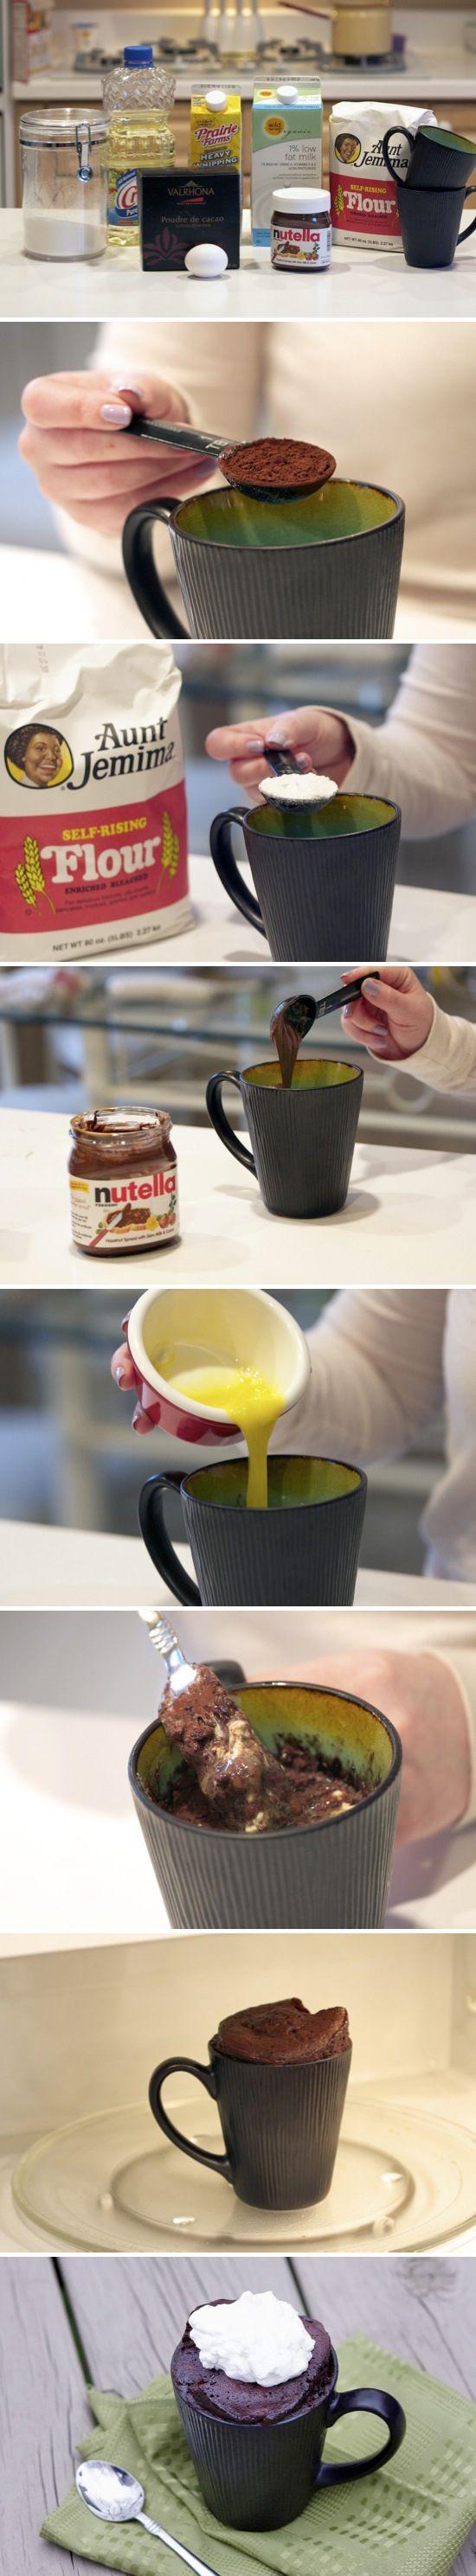 Microwave Mug Cake | Mug cake microwave, Nutella mug cake ...